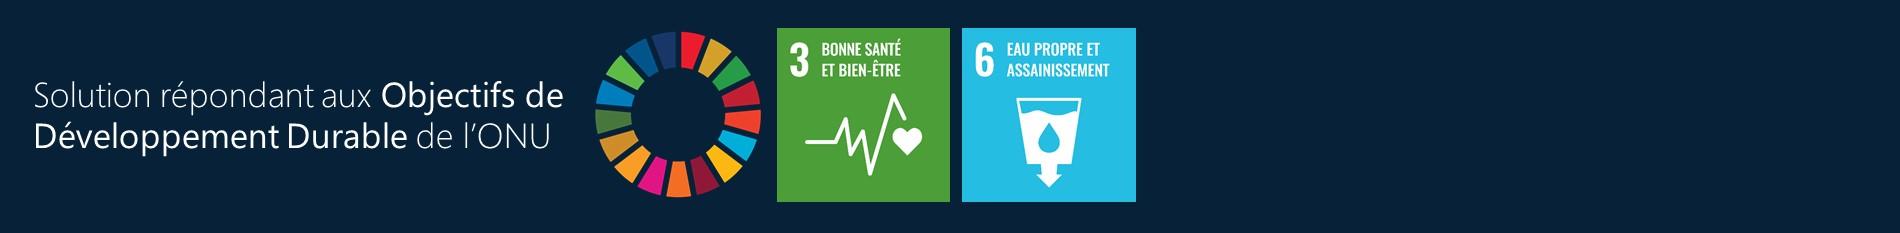 Objectifs Developpement Durable ONU PGSSE